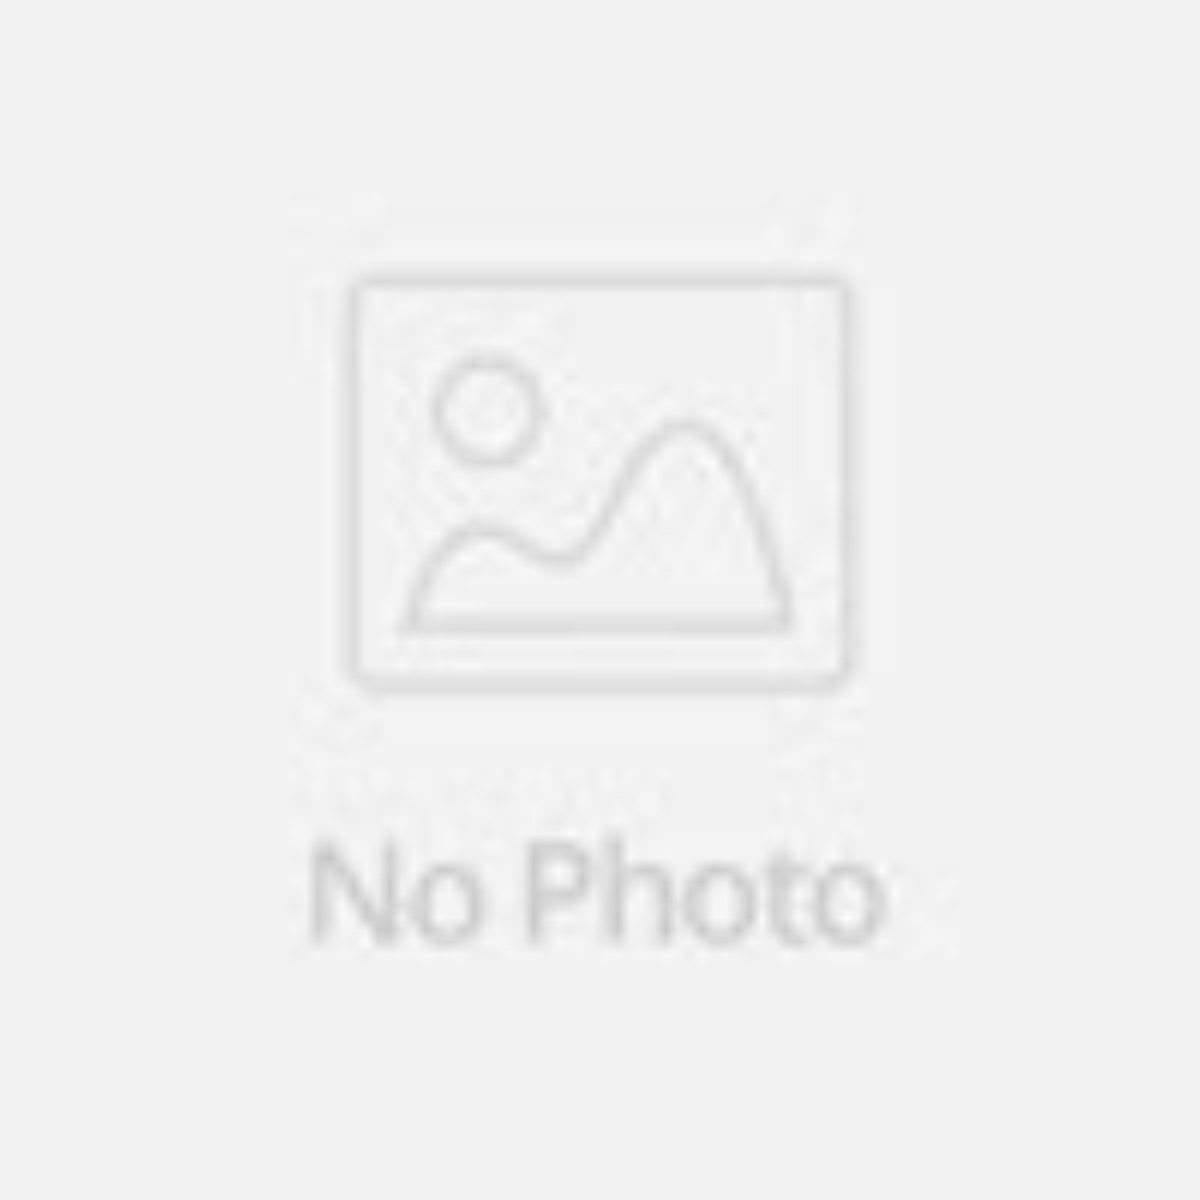 teal blue bathroom accessories - bathroom